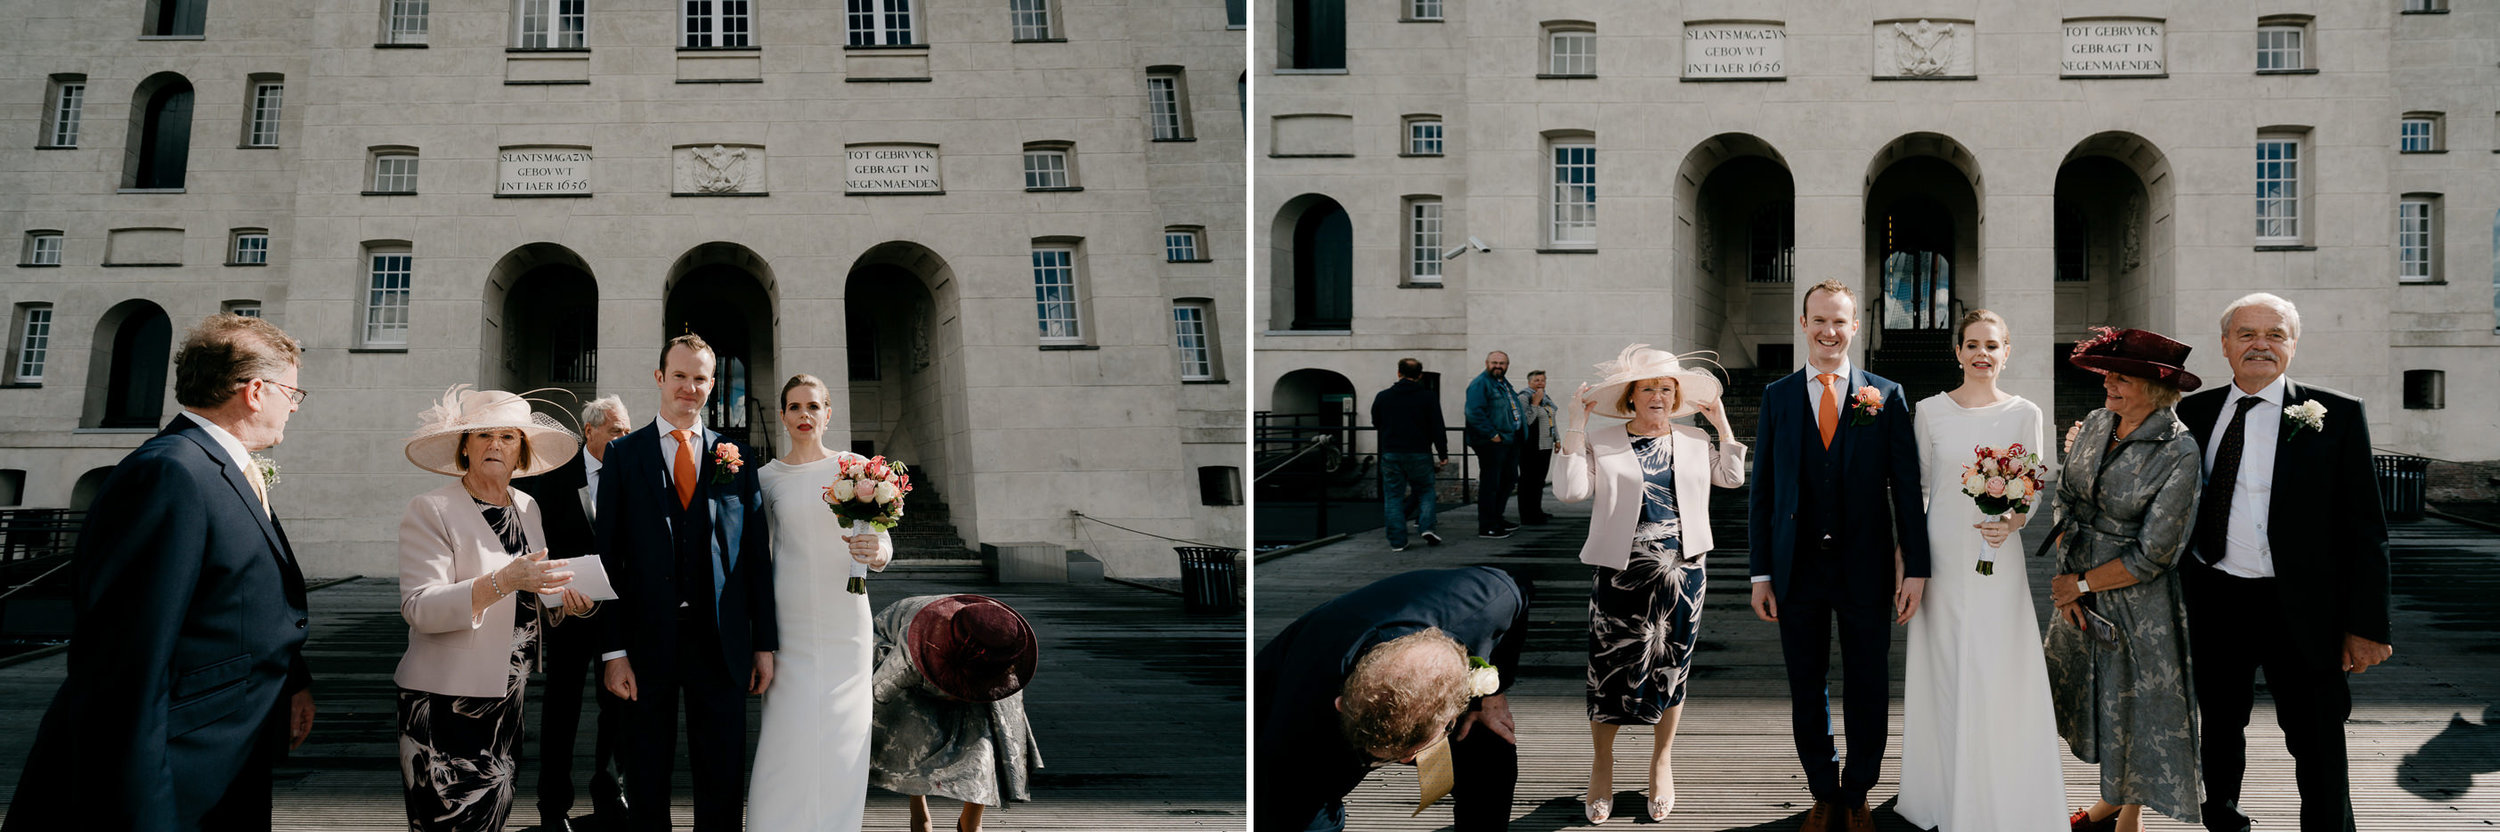 bruidsfotografie-trouwfotograaf-wedding-photographer-amsterdam-James-Jantine-216 copy.jpg